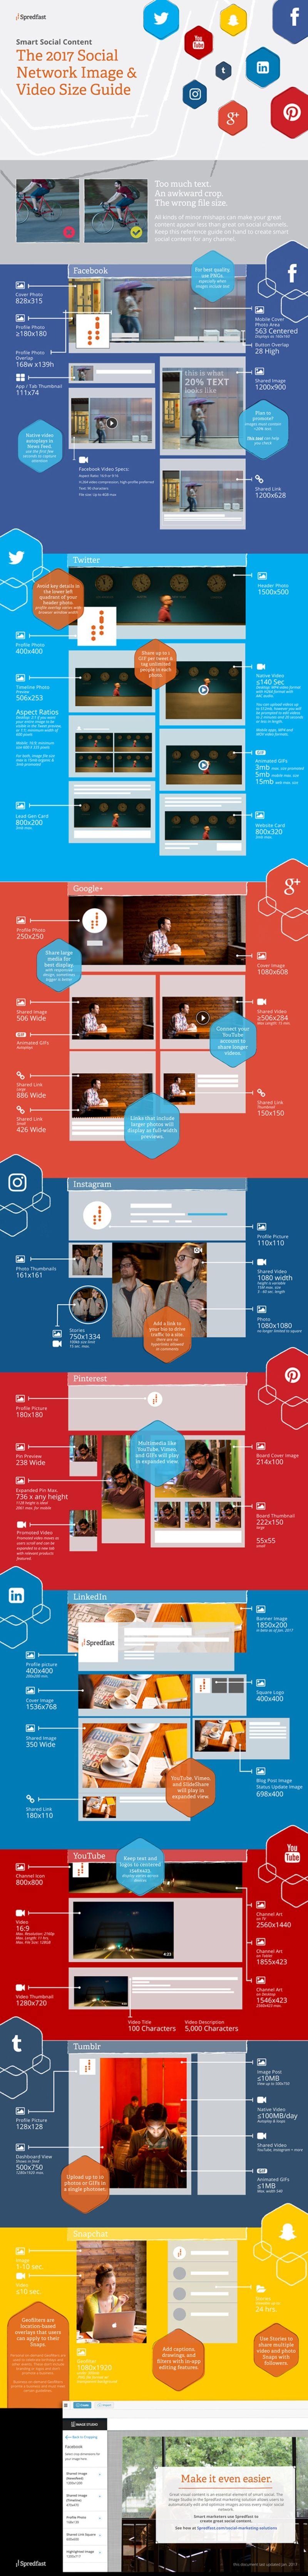 hubspot-social-image-size-guide.jpg